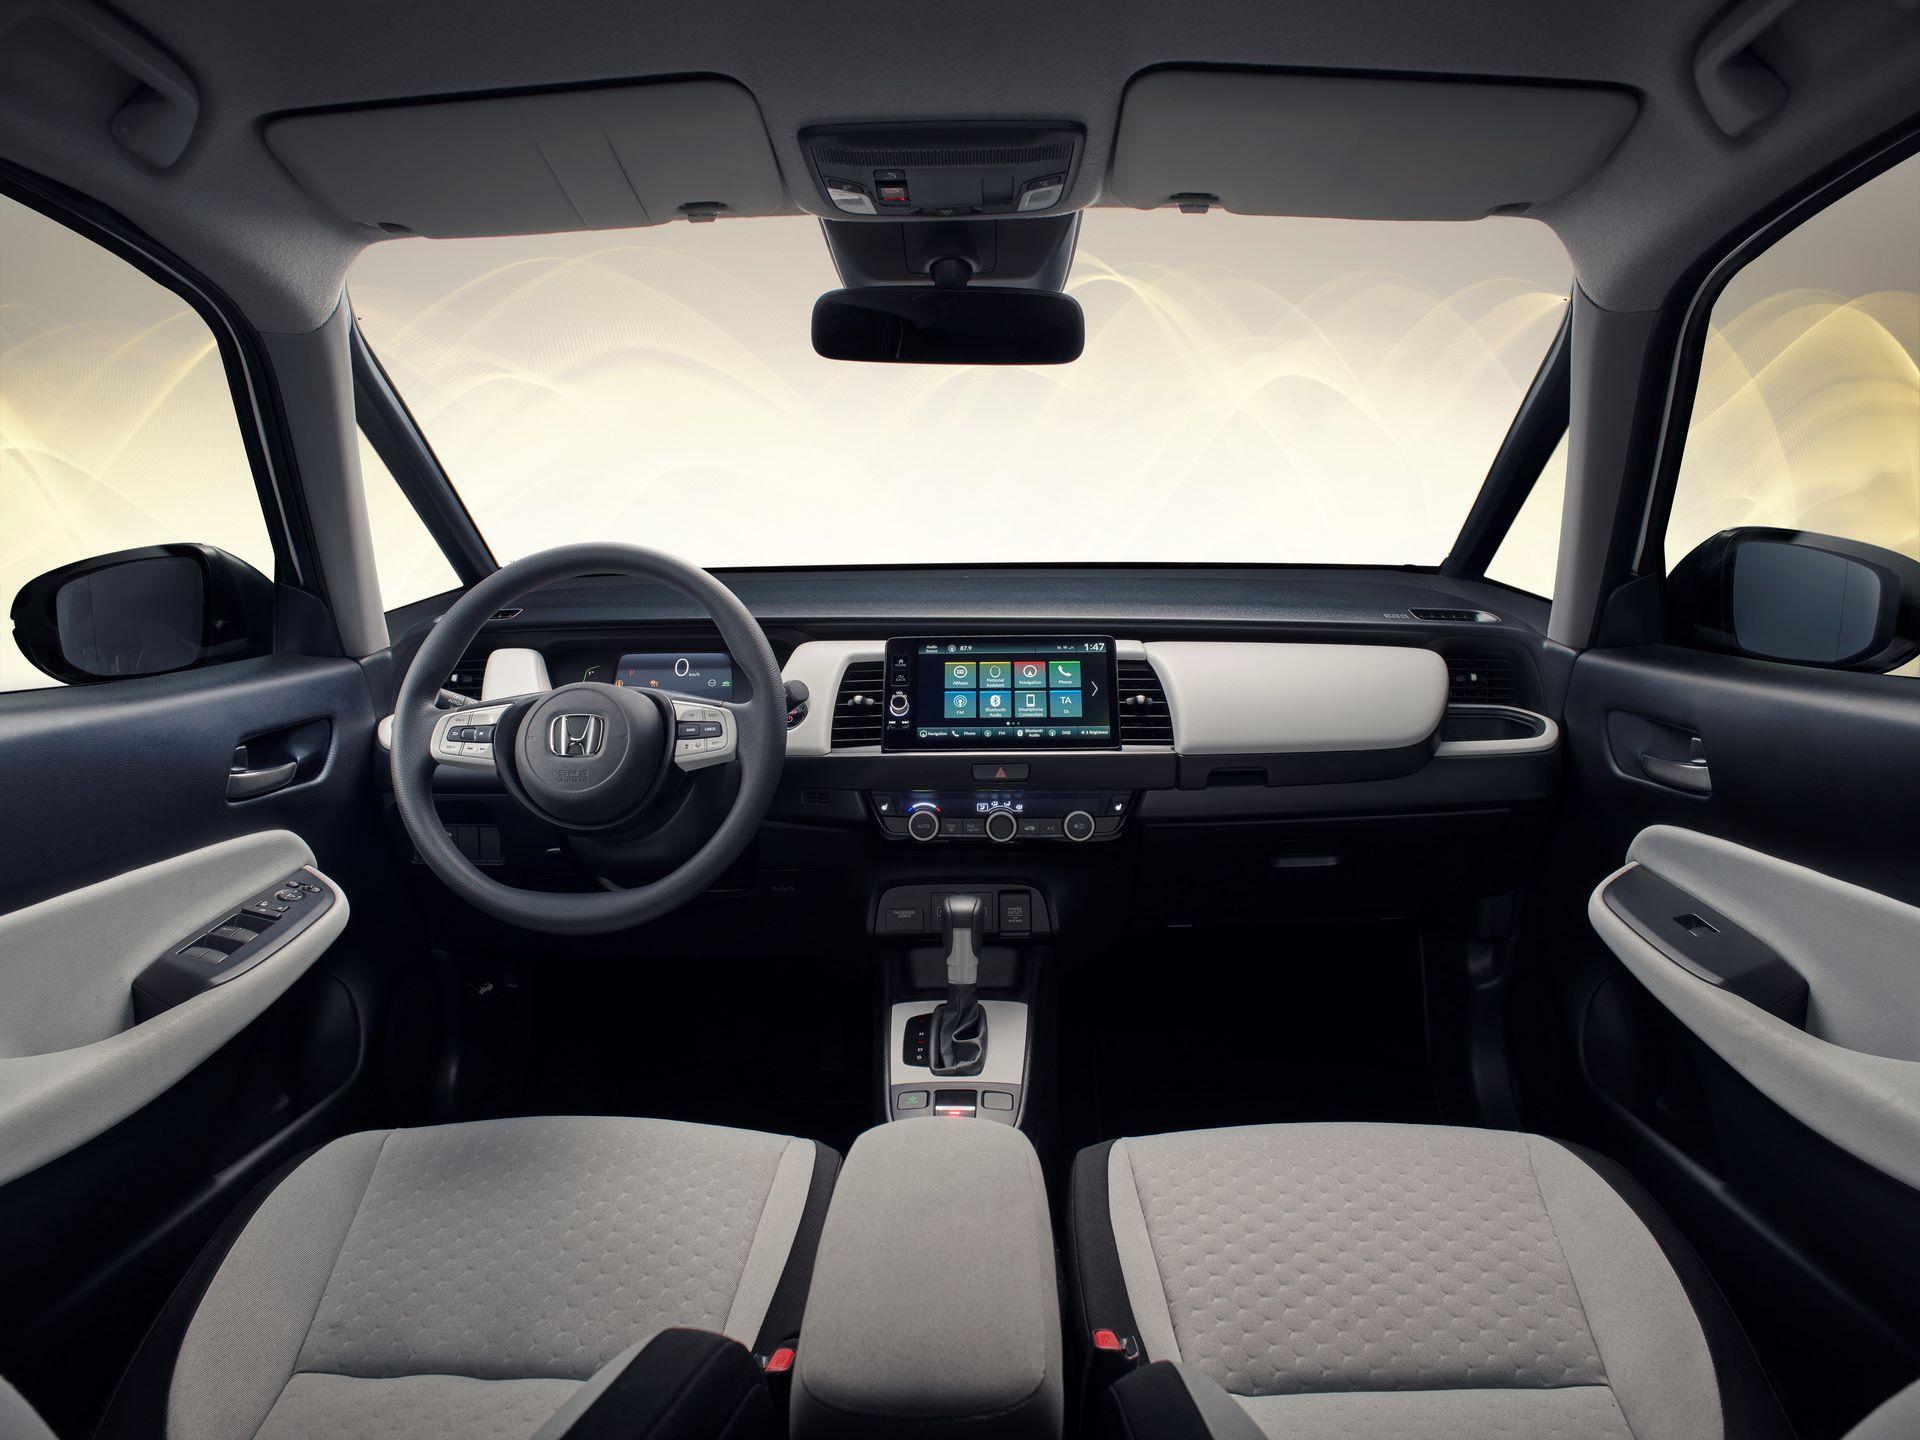 Honda Jazz Interior View